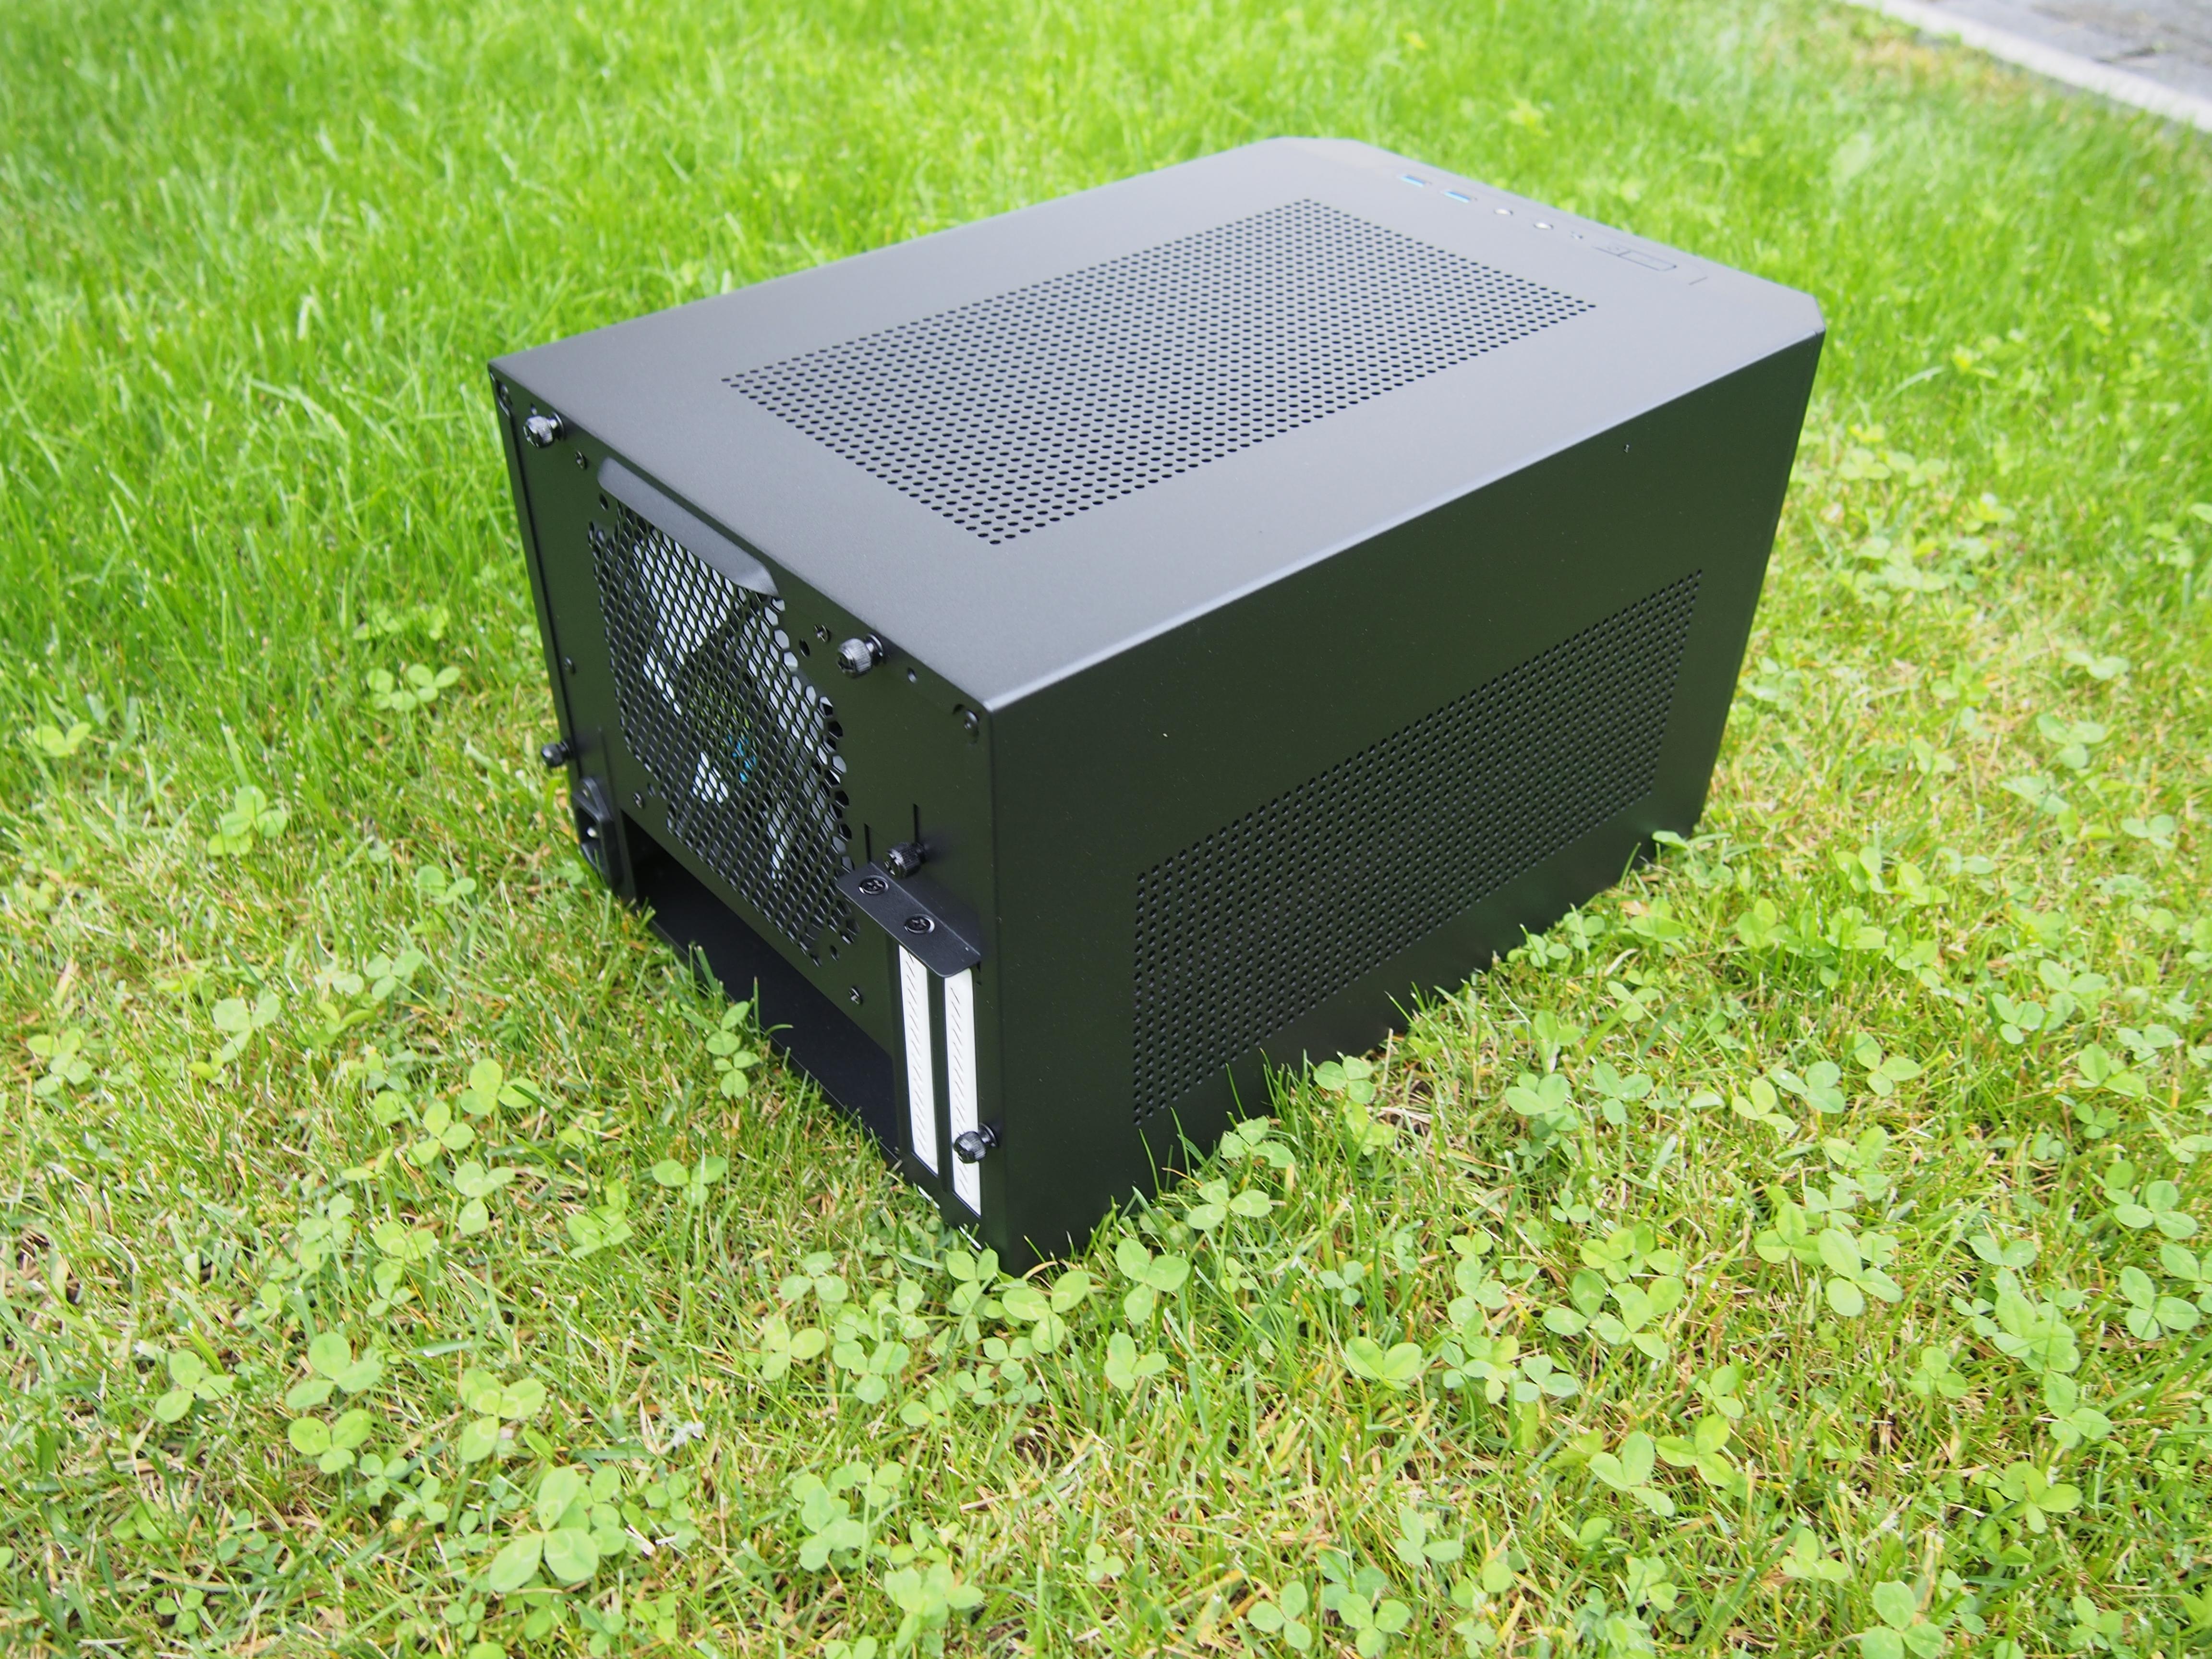 Leserartikel - Fractal Design Core 500 Mini ITX | ComputerBase Forum